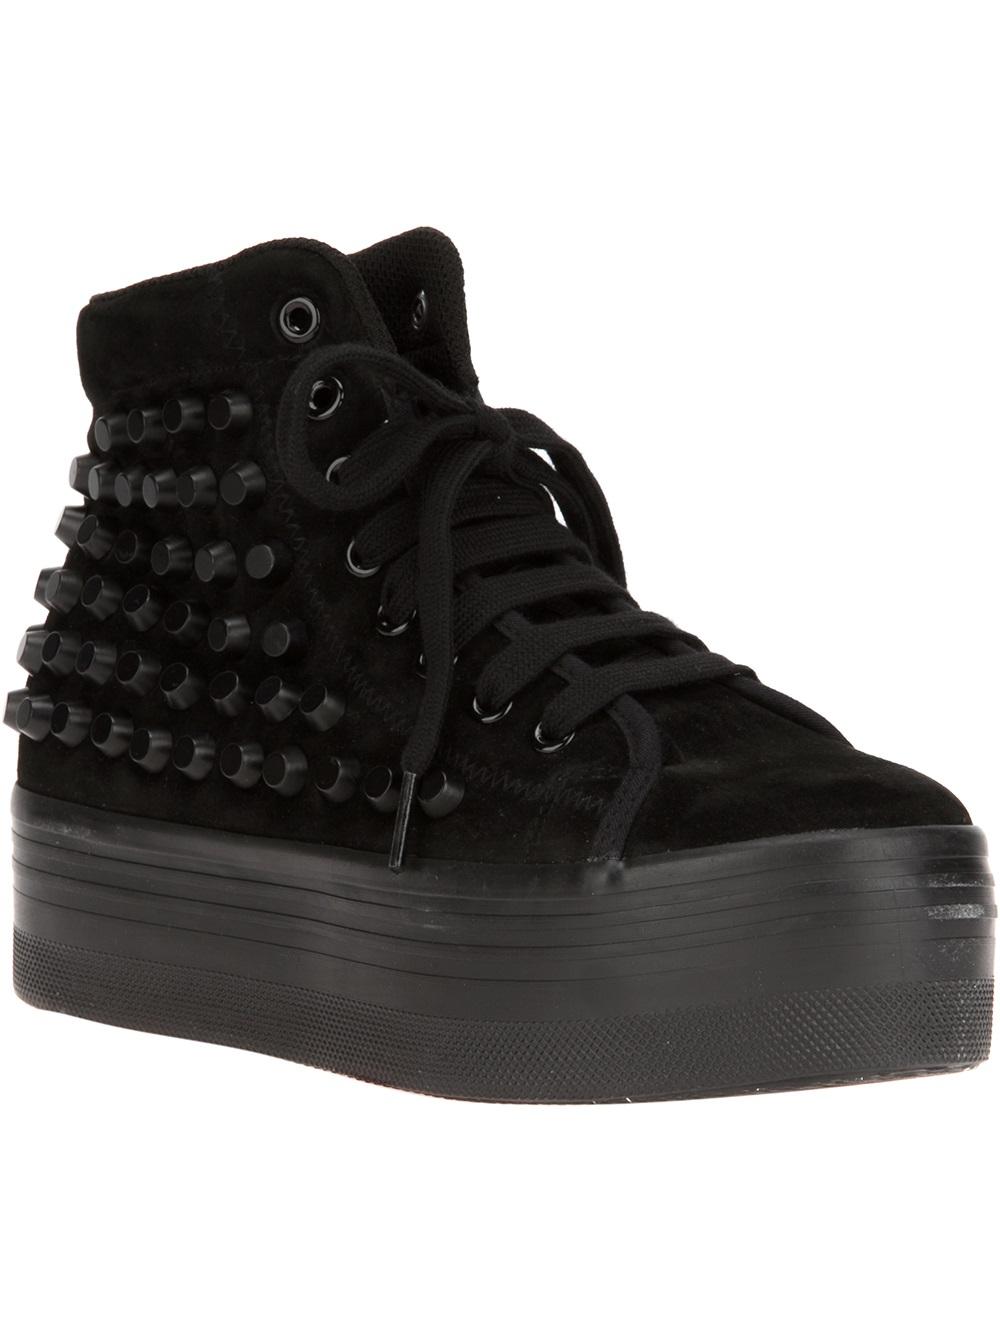 Jeffrey Campbell Omg Platform Sneaker In Black Lyst